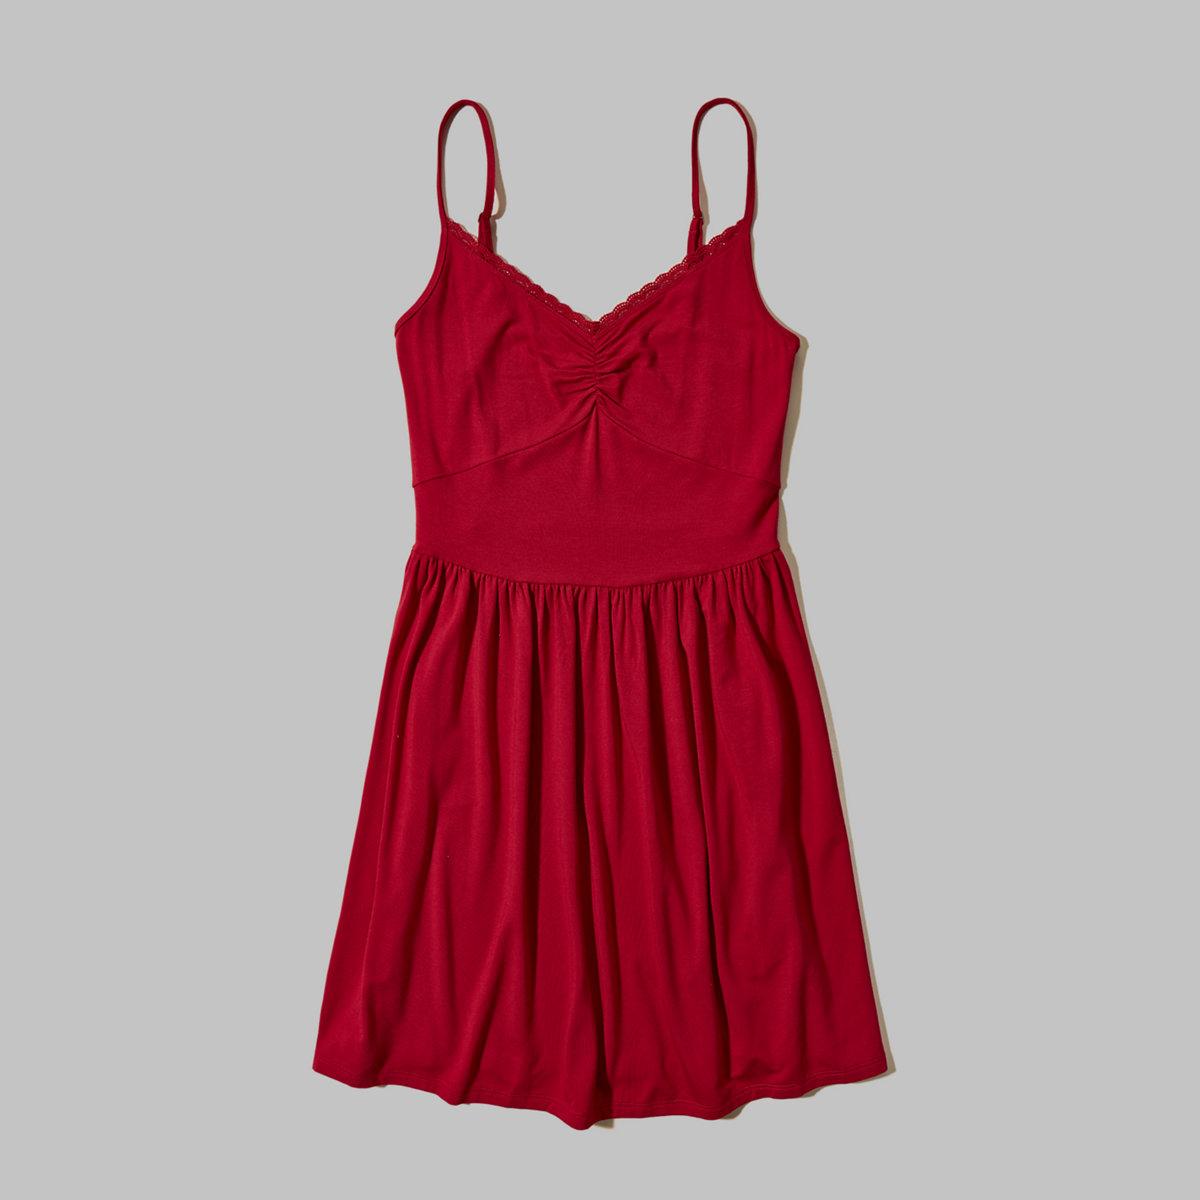 Knit Ballerina Dress